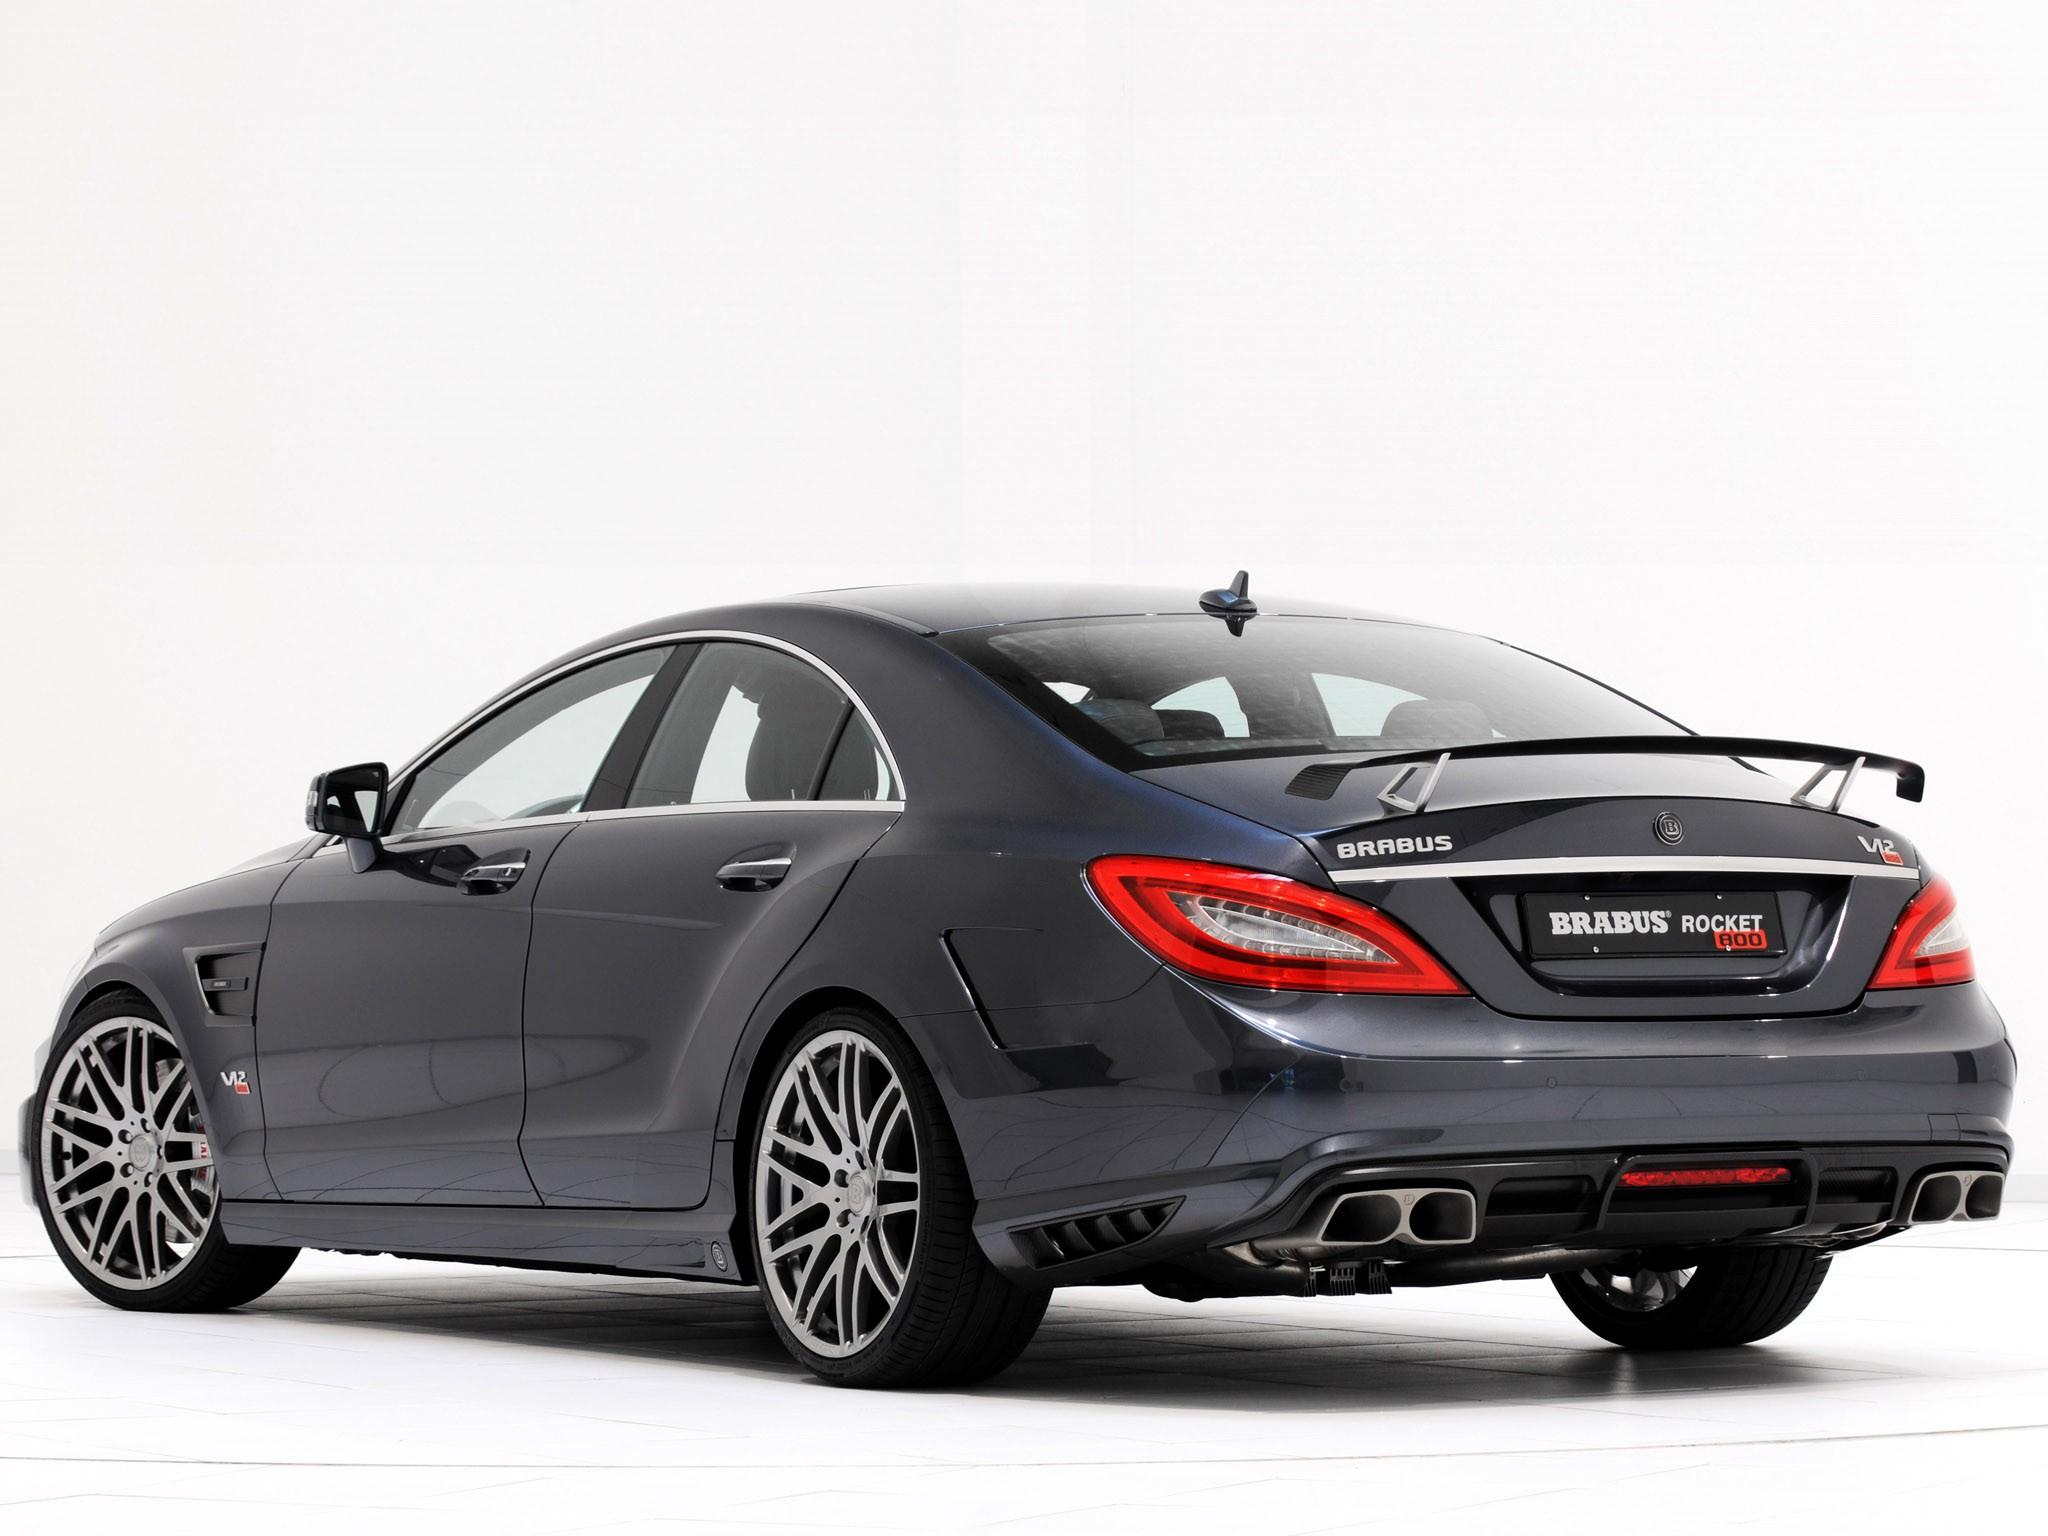 2011 Brabus Mercedes CLS Rocket 800 C218